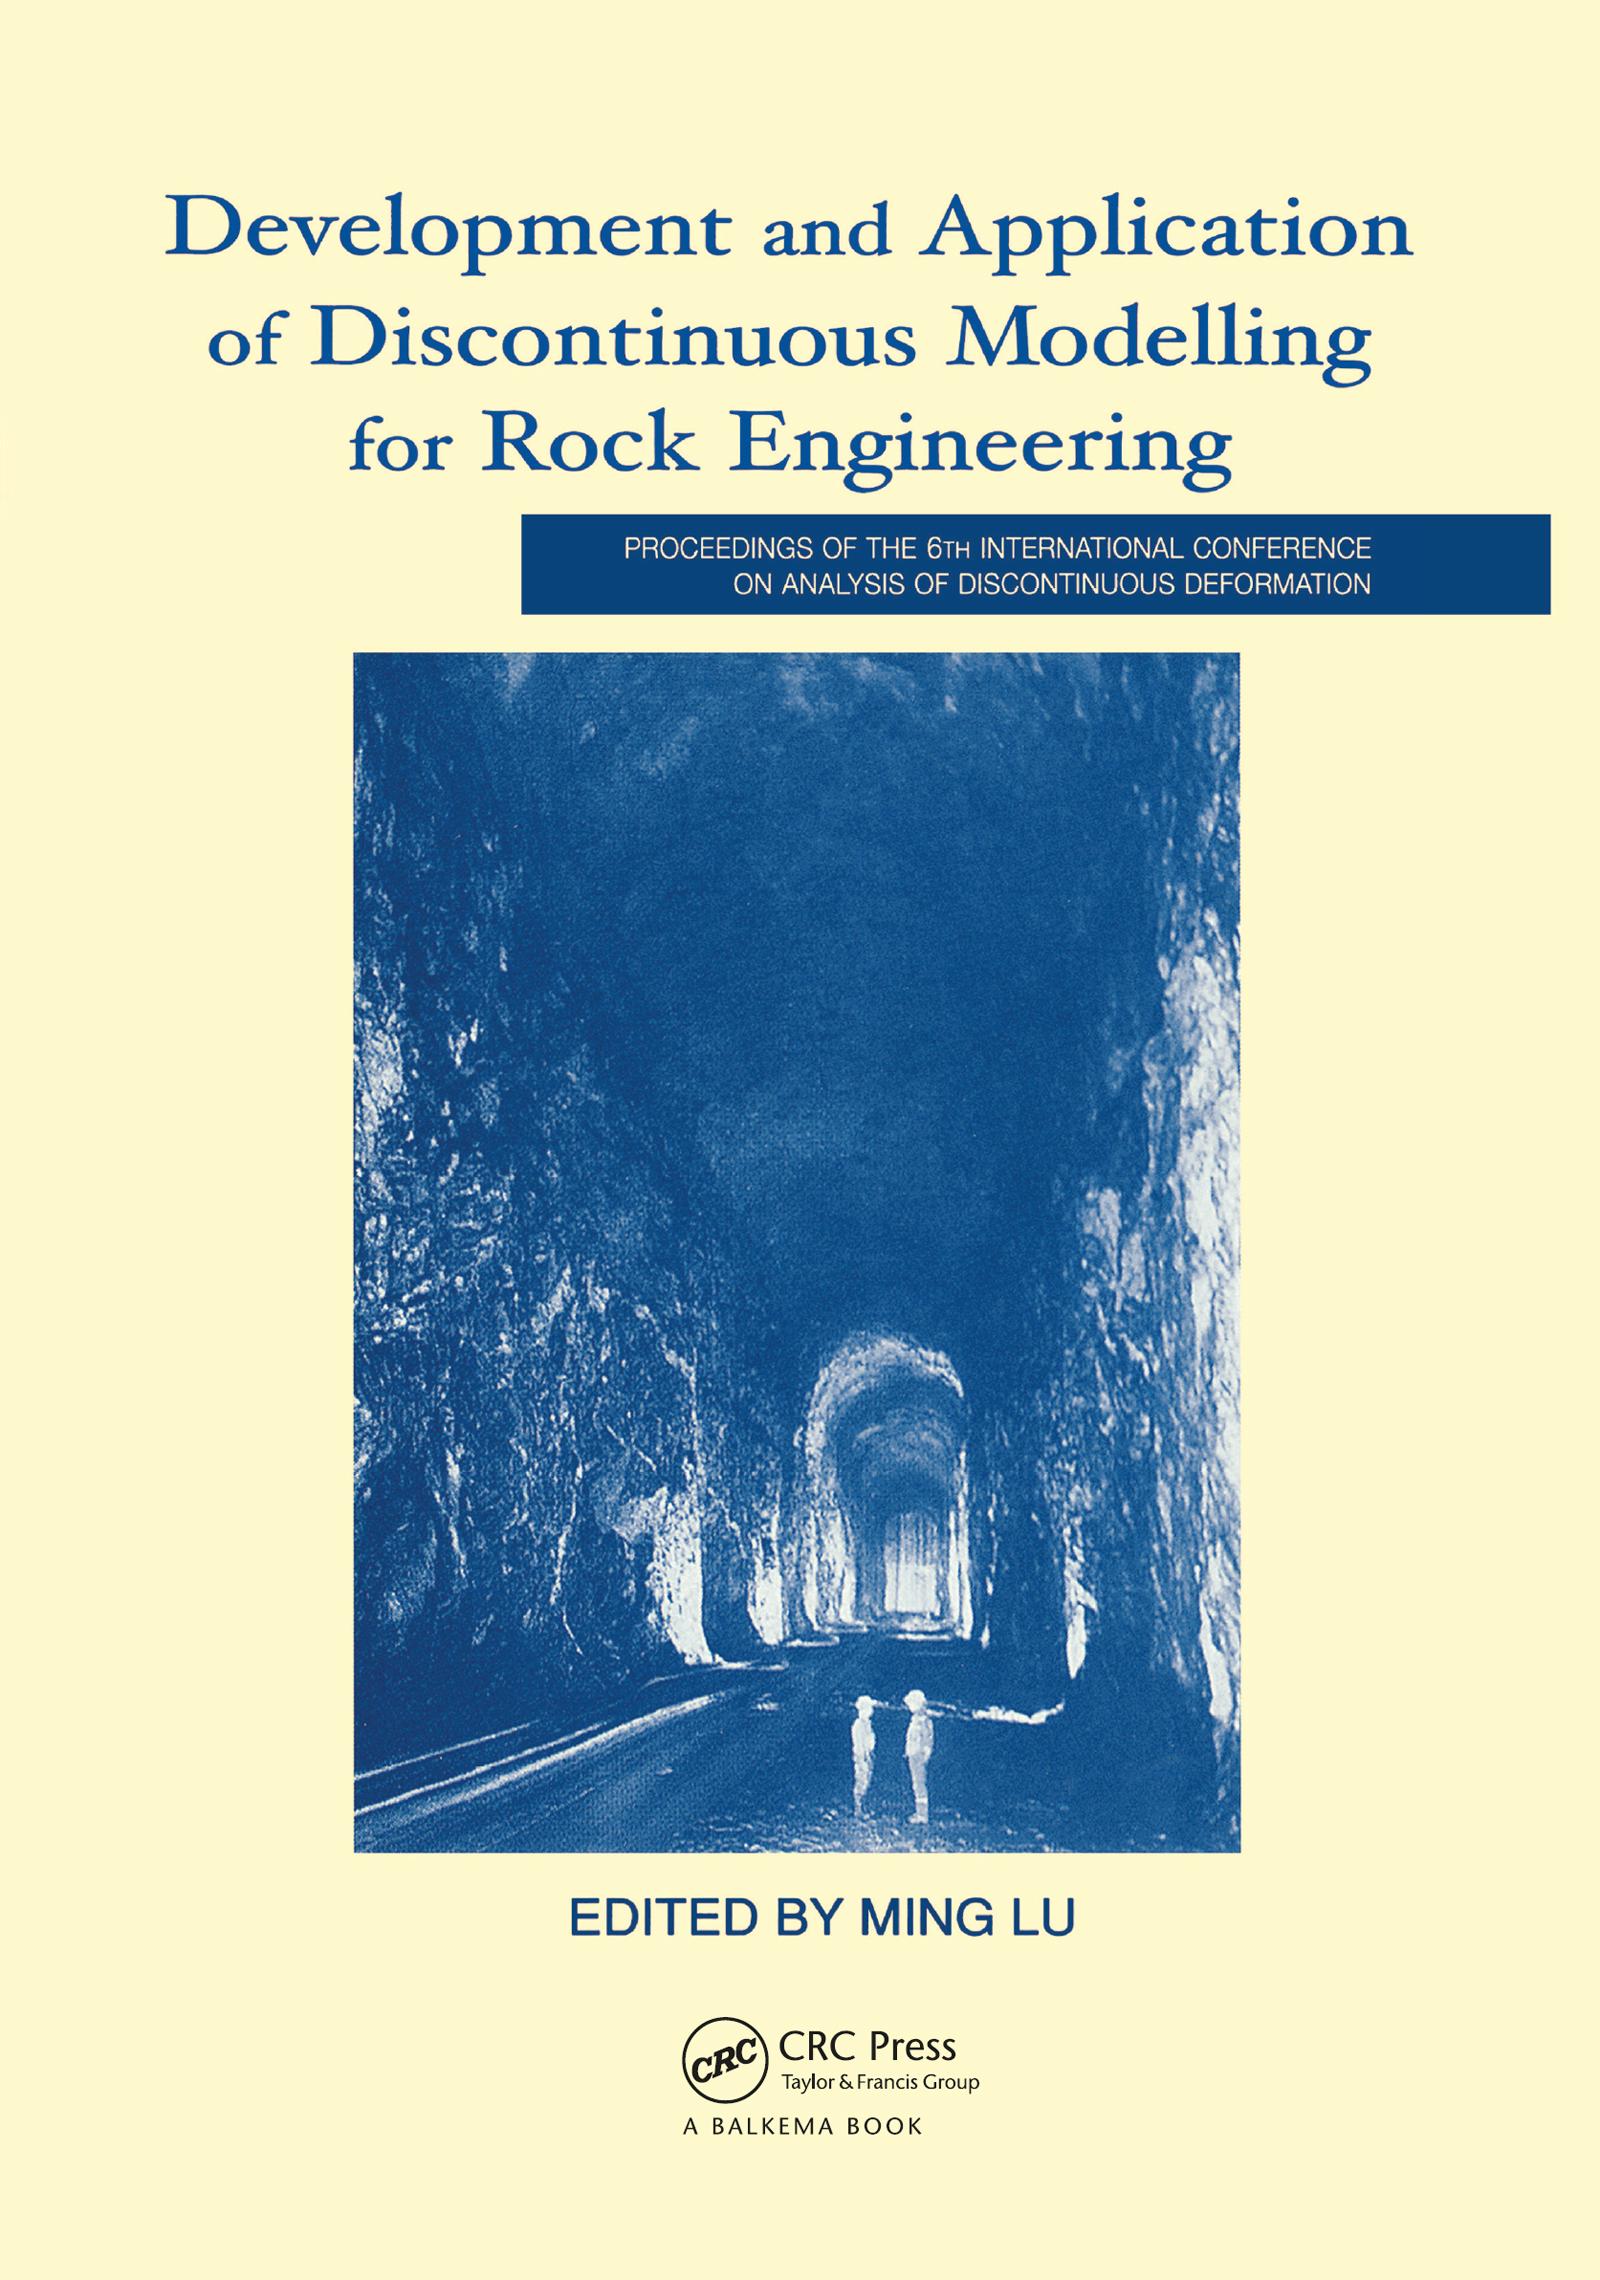 Large span cavern stability analysis – practical use of DDA